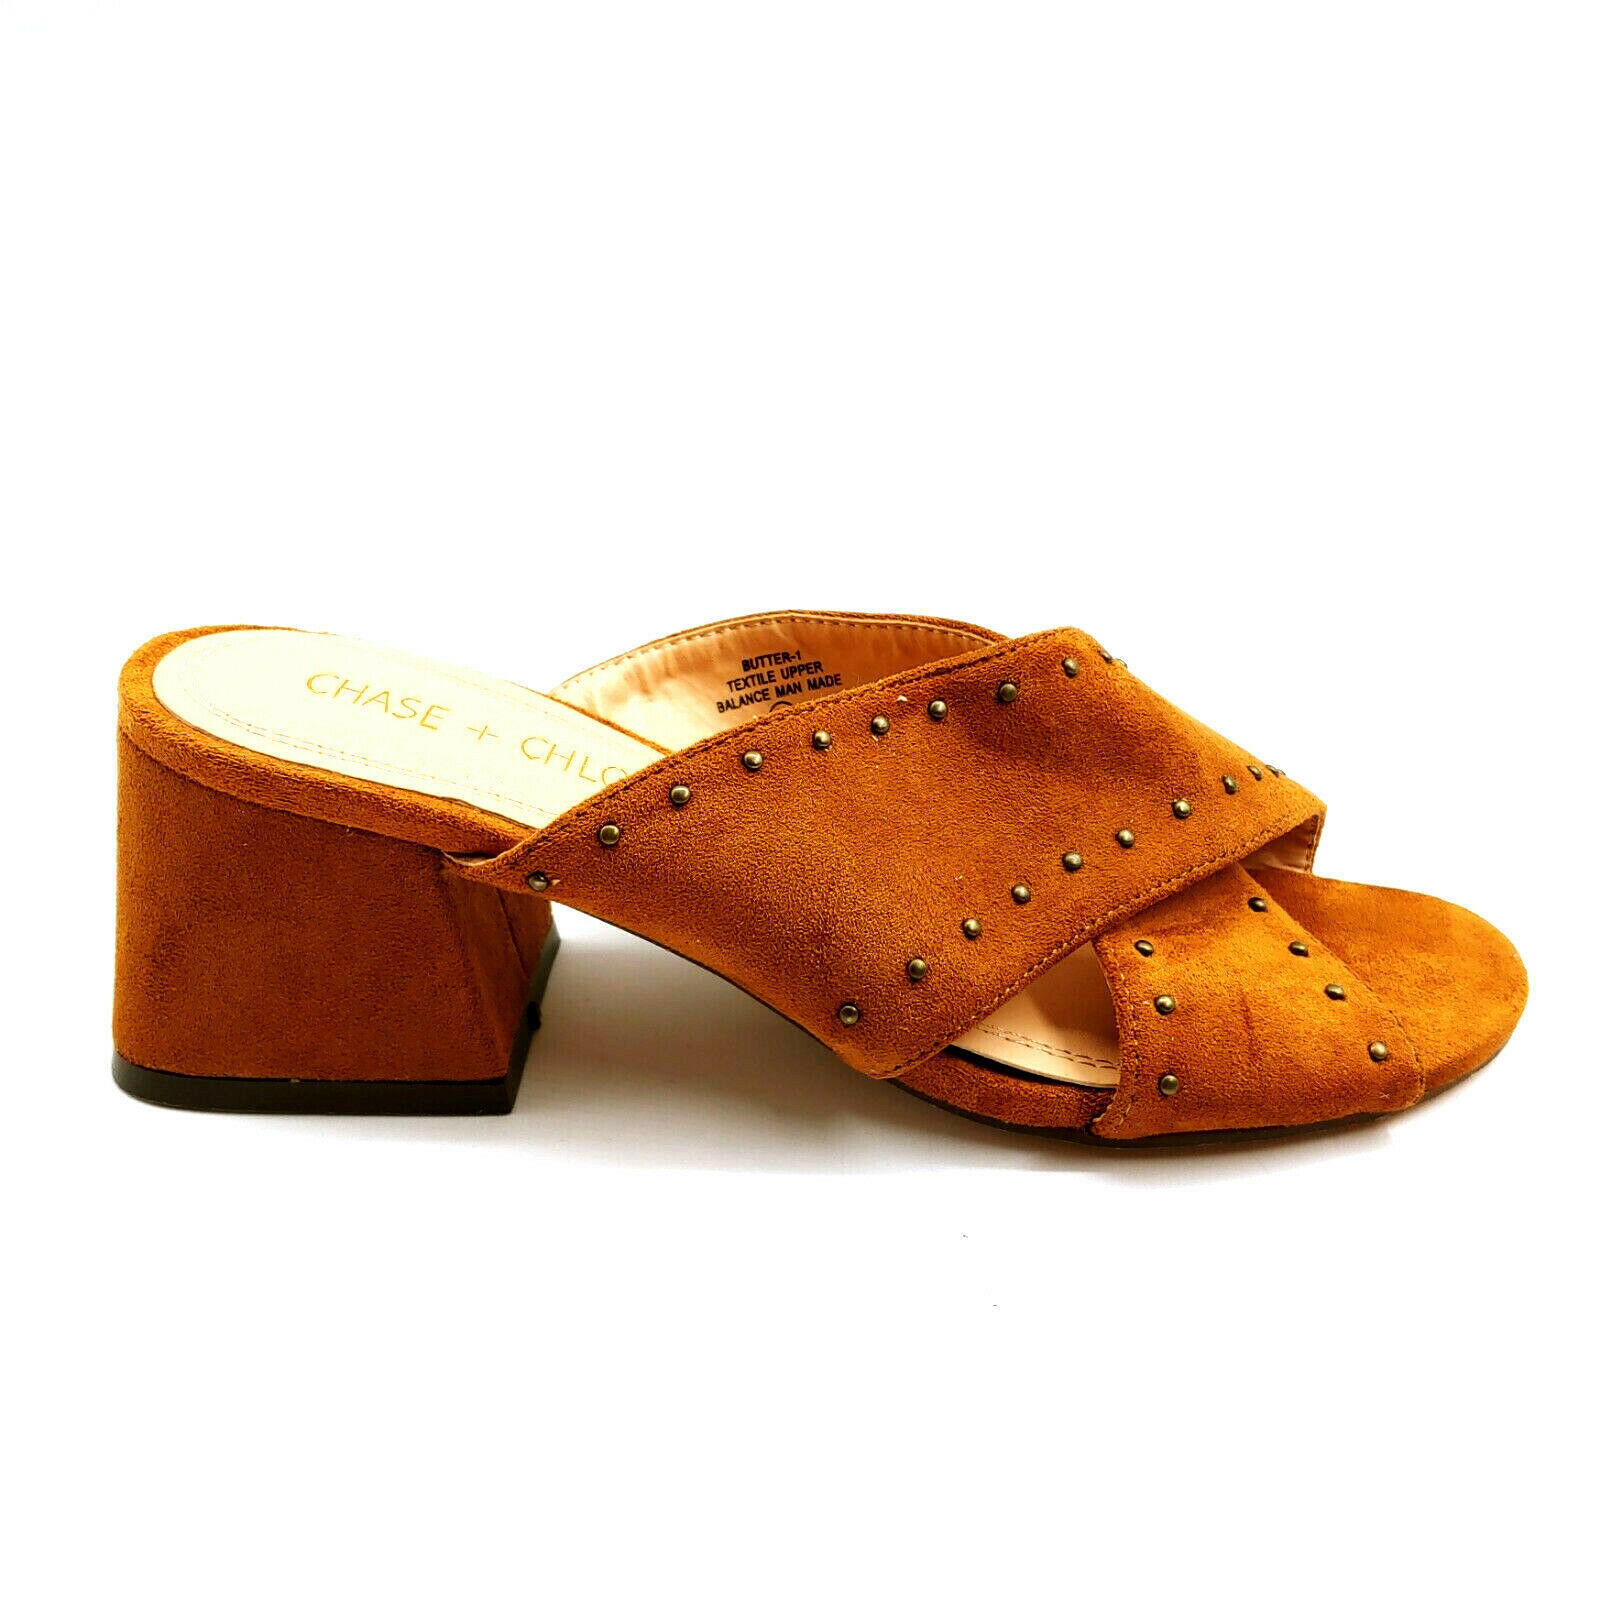 Chase & Chloe Woman Butter Cross Strap Slide Sandal Gold Faux Suede Sz 5.5 M  - $34.64